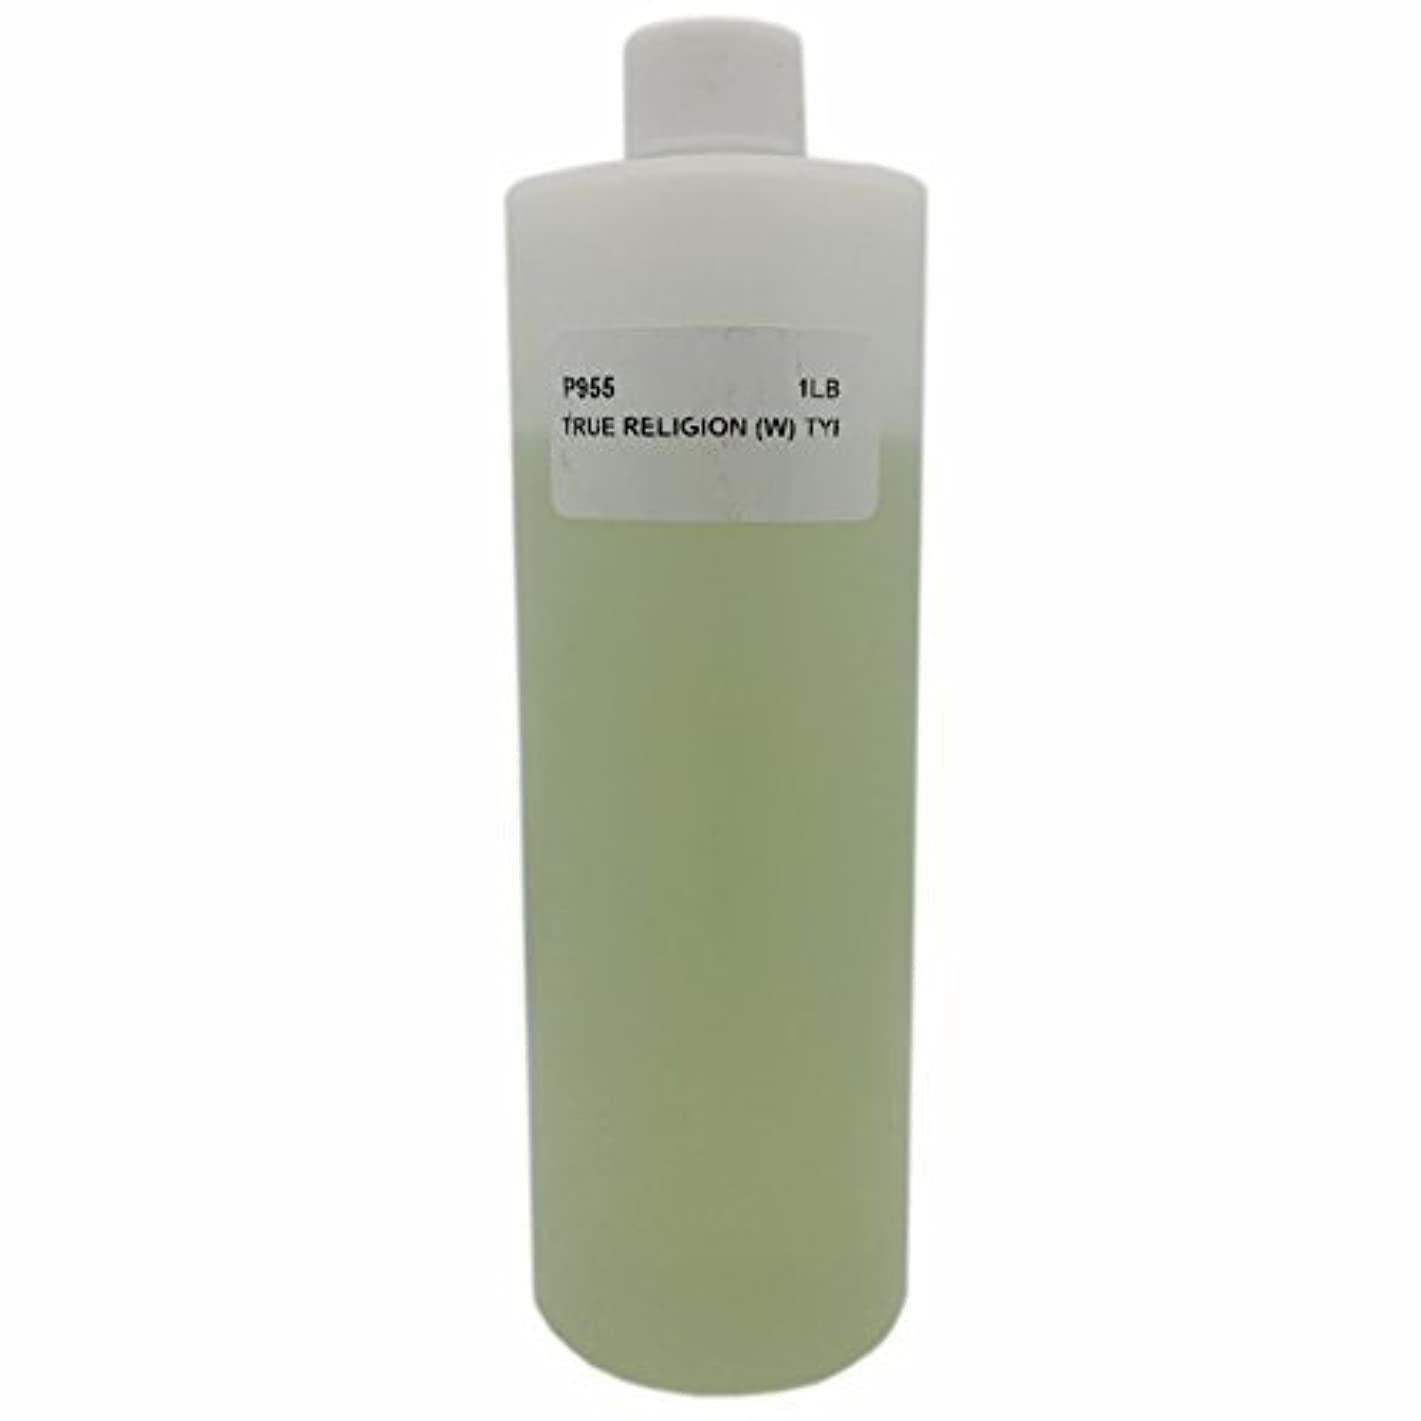 1 oz, Light Yellow - Bargz Perfume - True Religion Body Oil For Women Scented Fragrance